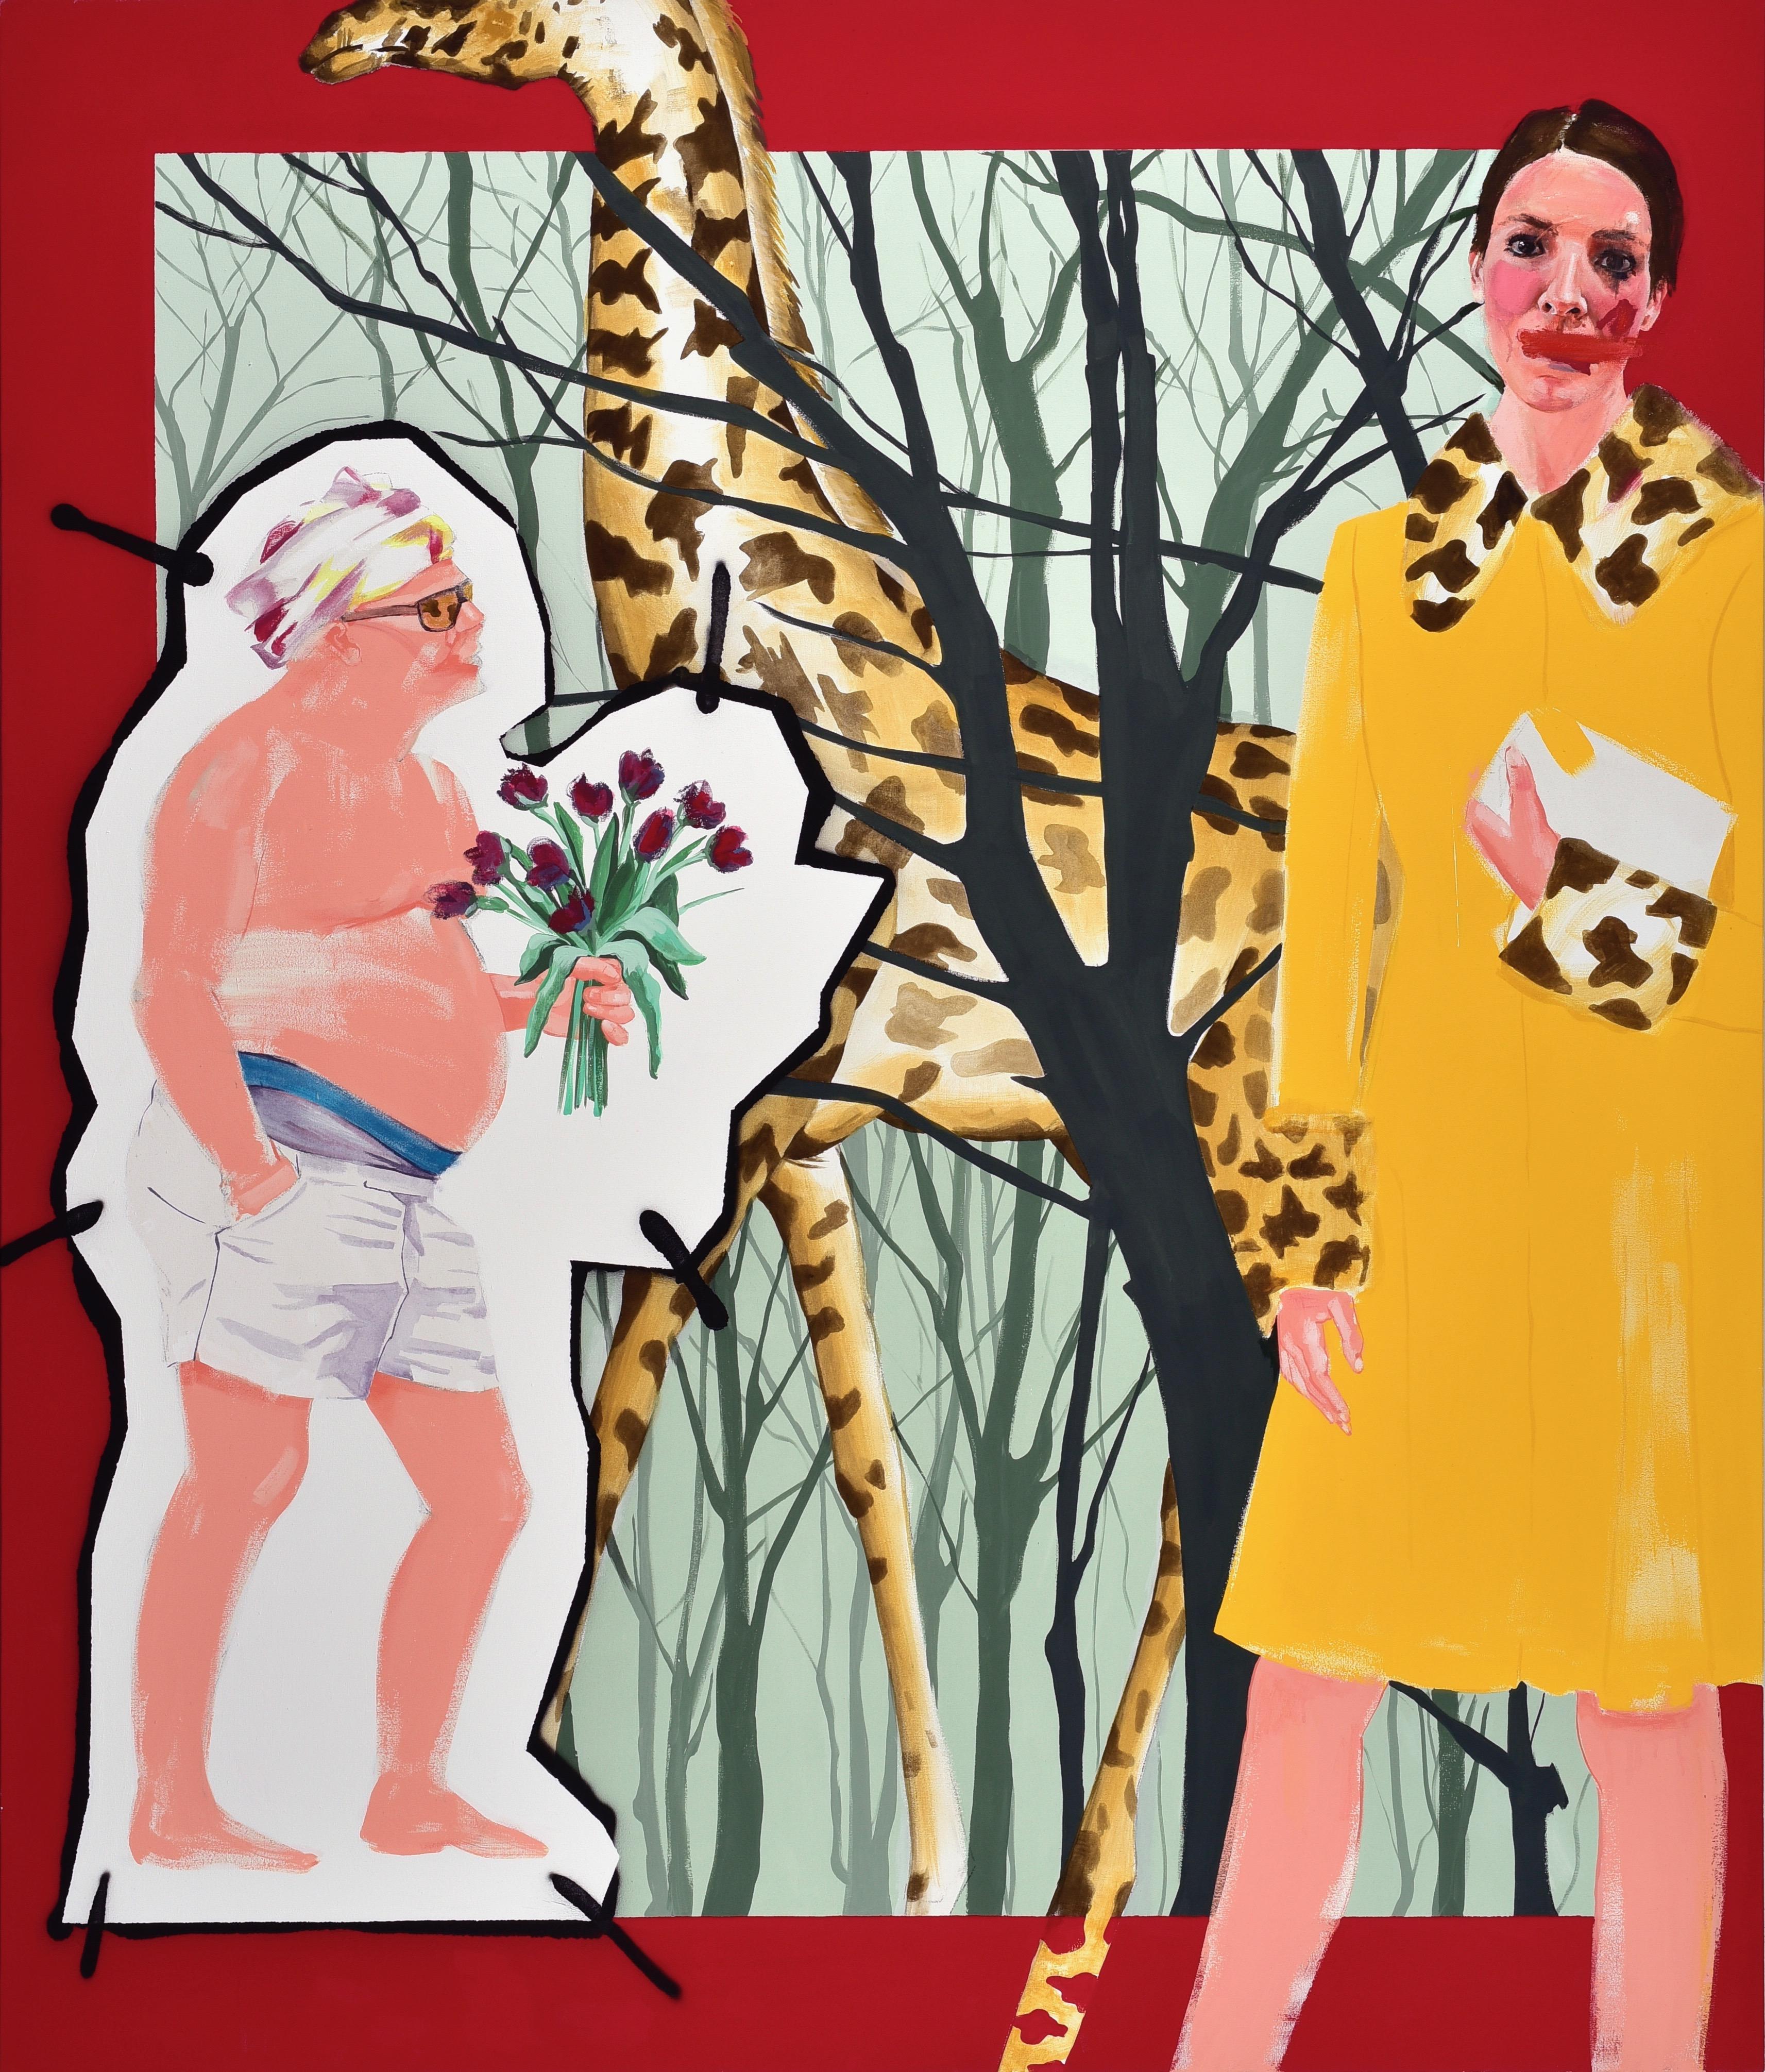 Stella Kapezanou, The Girl in the Miu Miu, oil and acrylic on canvas, original, 210 x 170cm, £3,900, Made in Arts London.